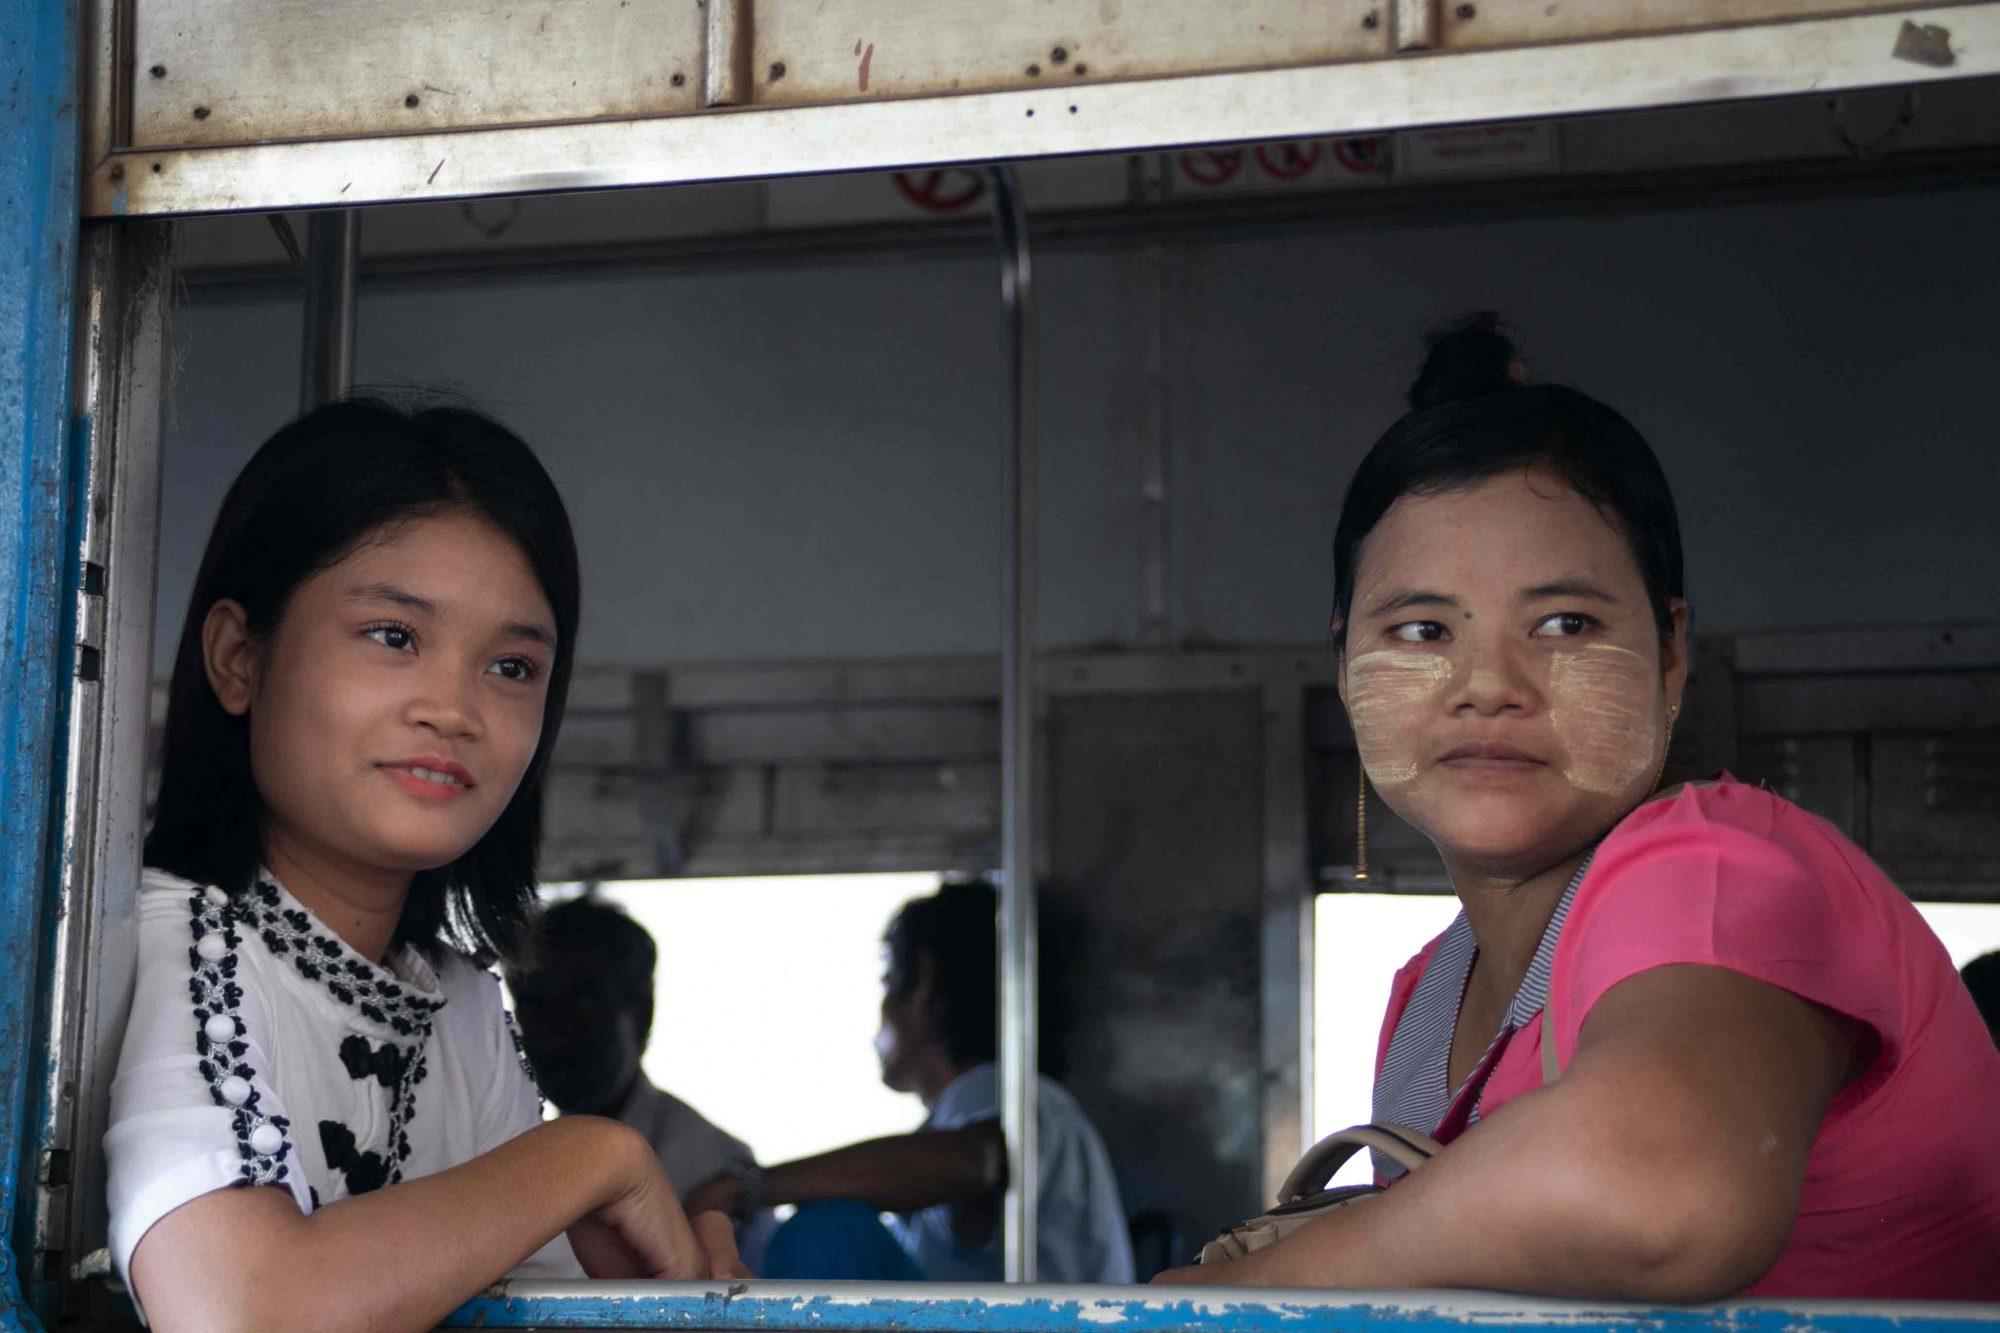 ¡Mingalabar! Bienvenidos a Myanmar